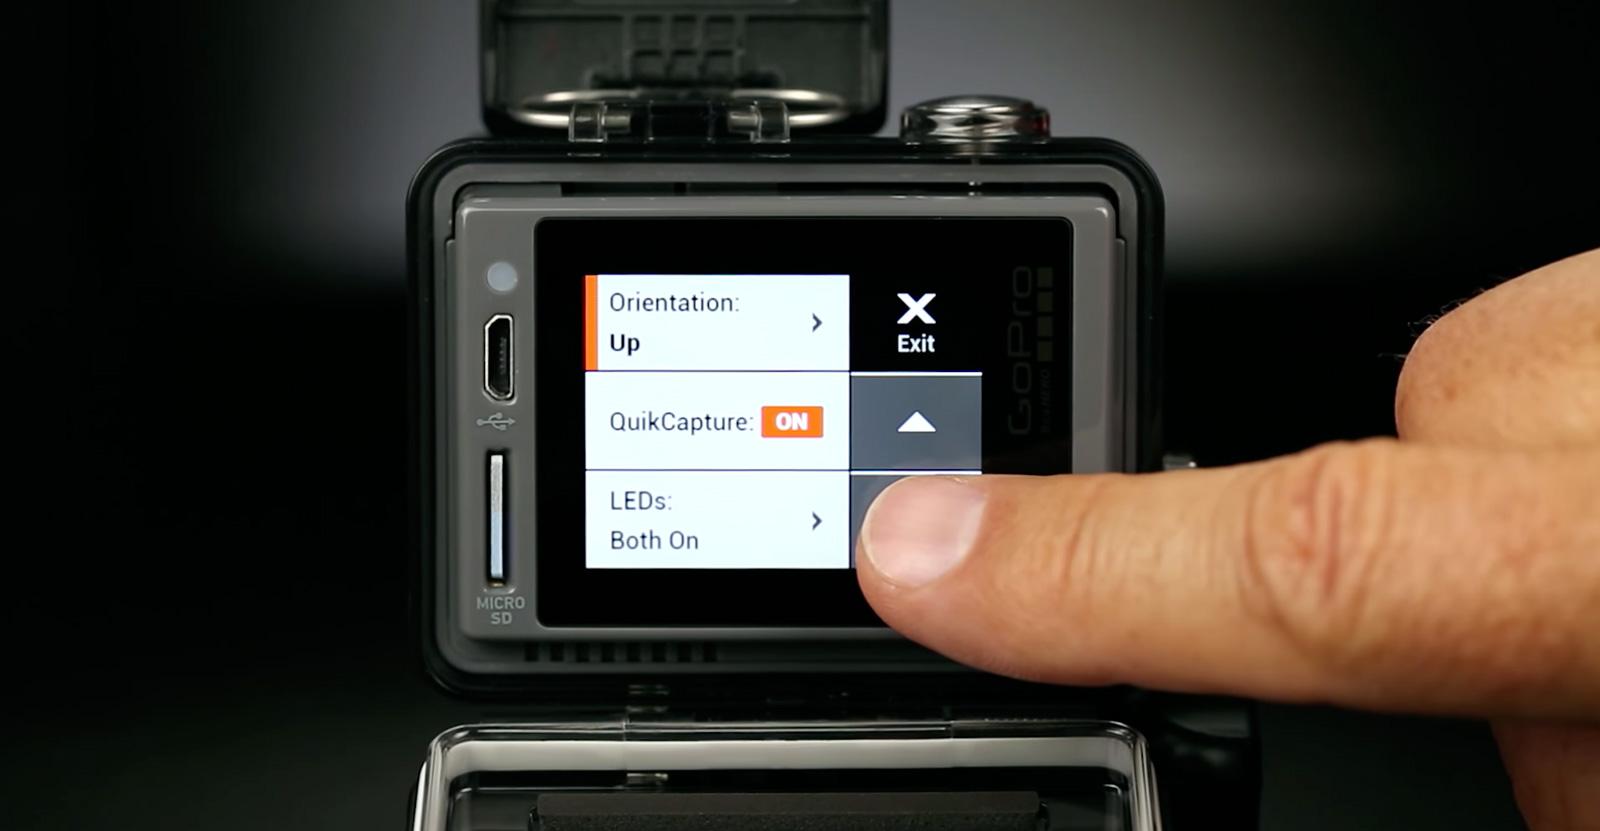 Go Pro Touchscreen